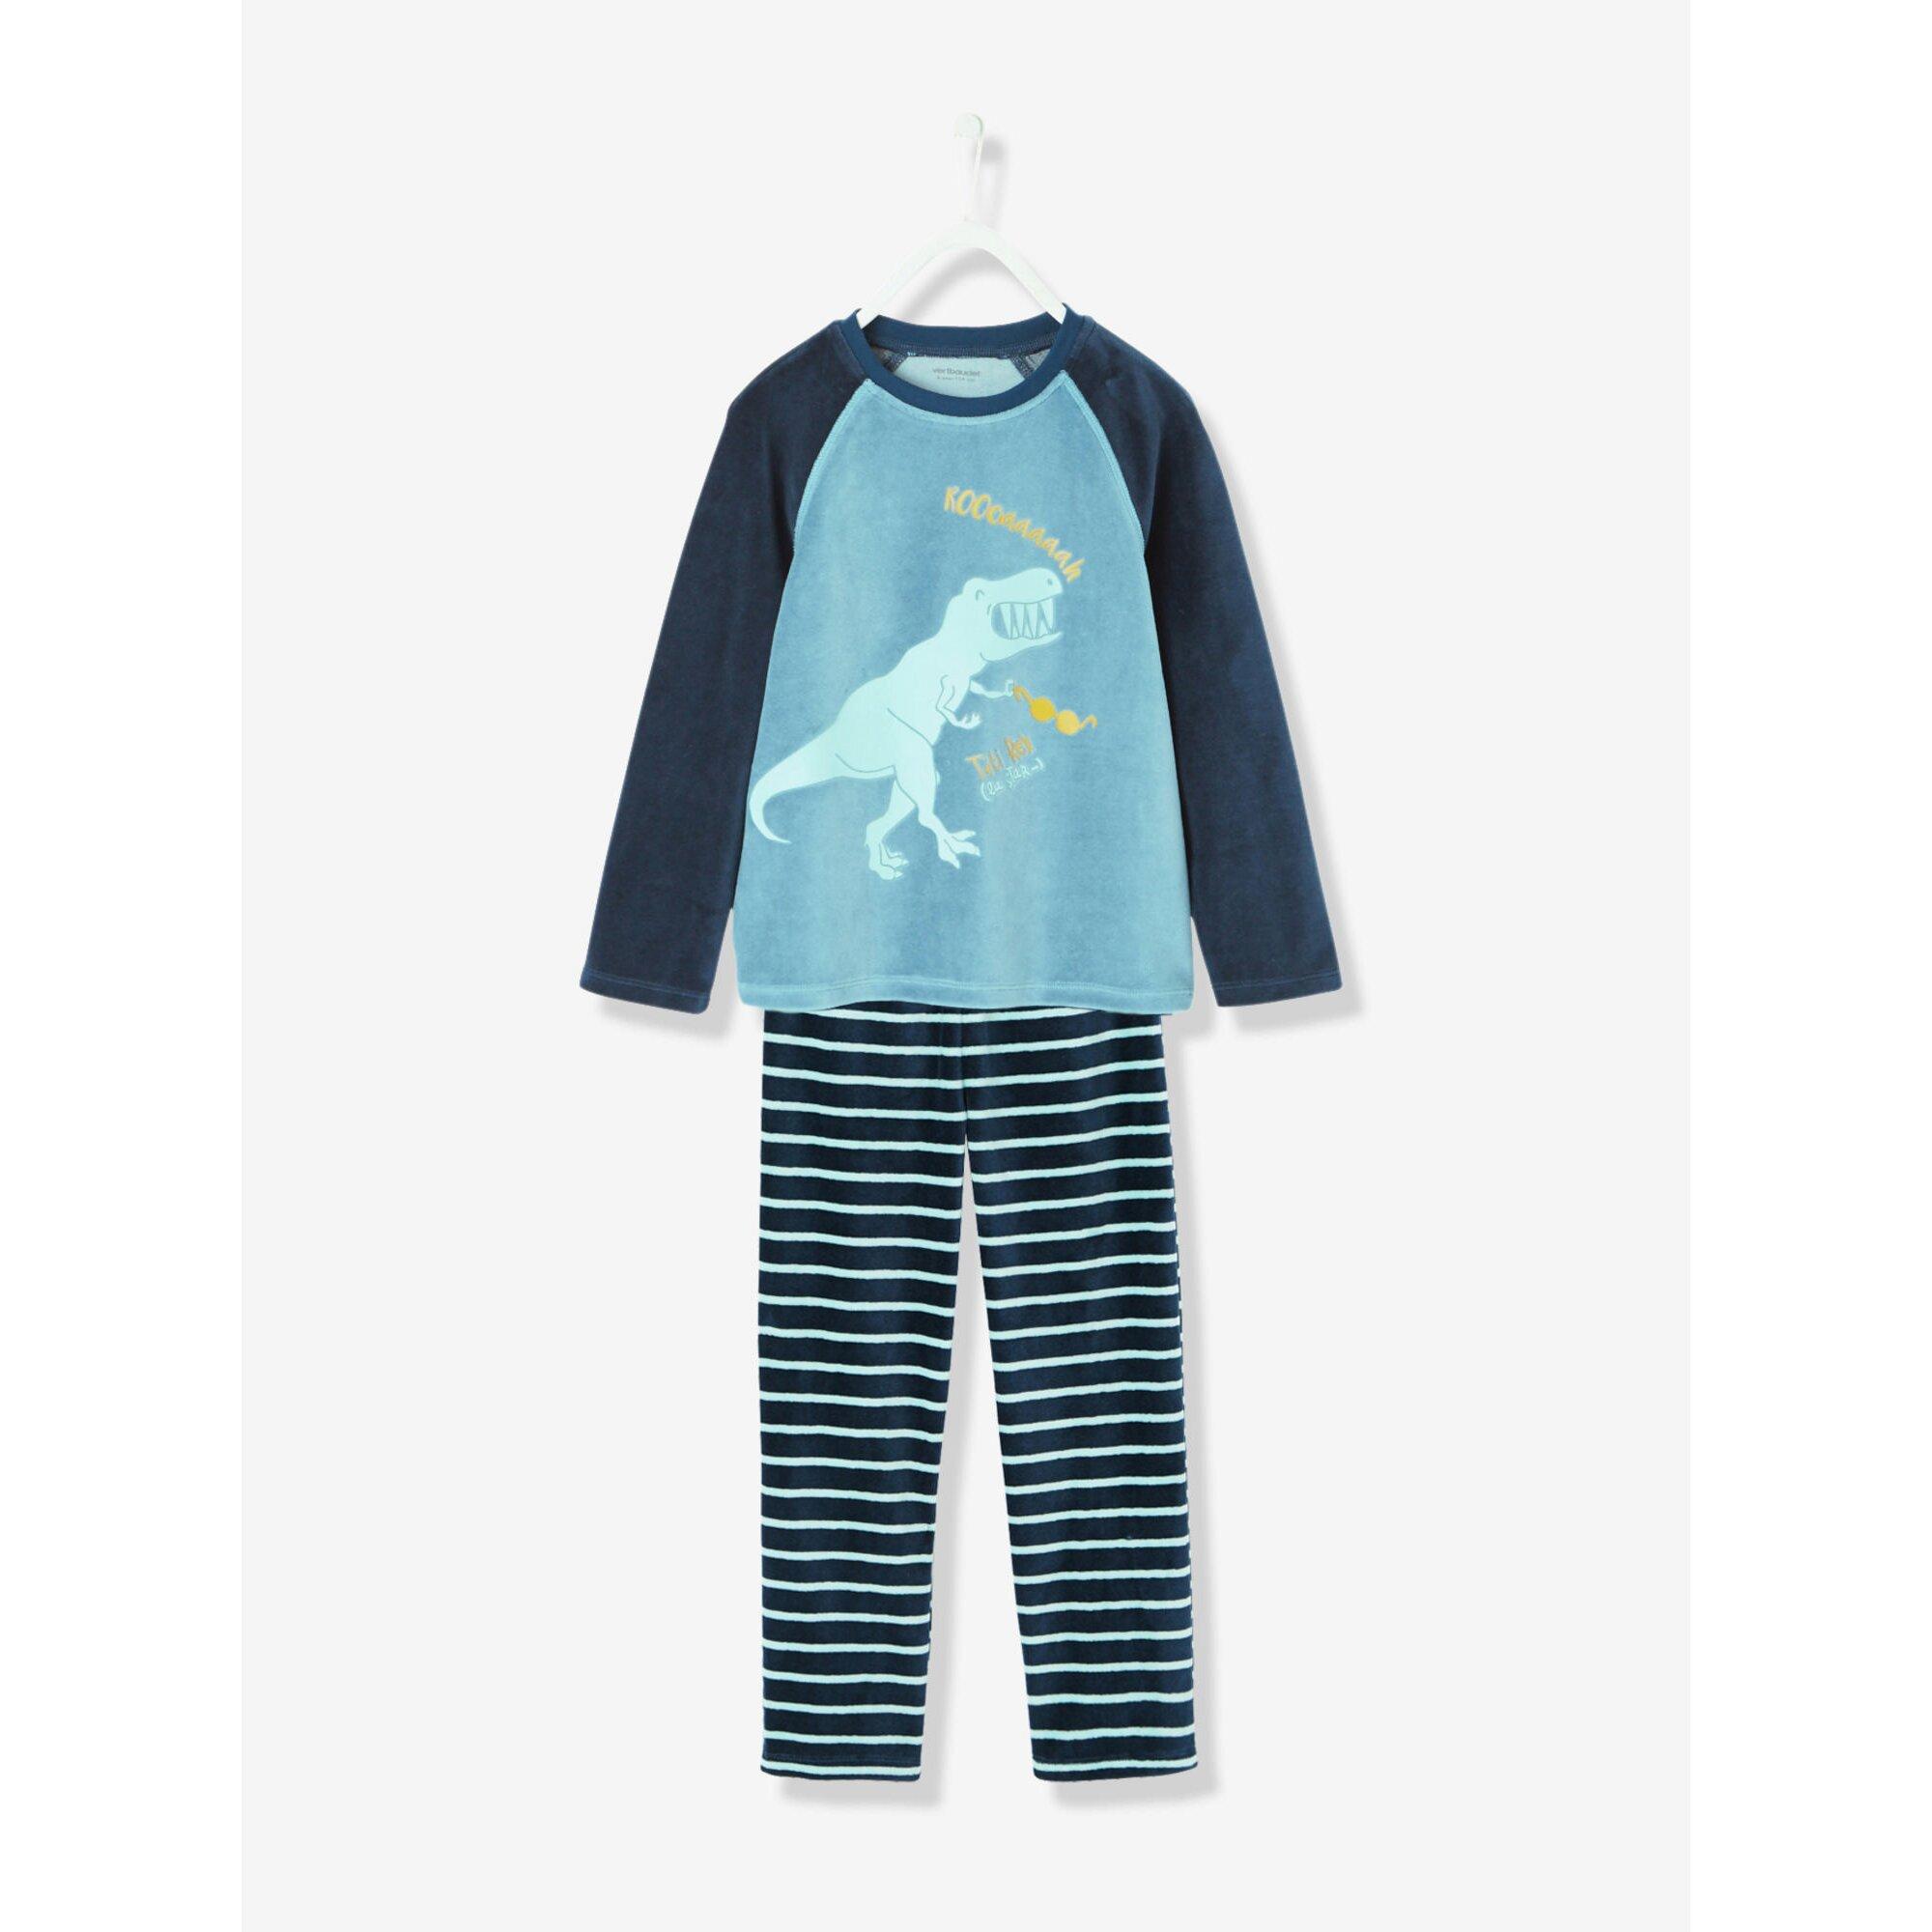 vertbaudet-samt-pyjama-fur-jungen